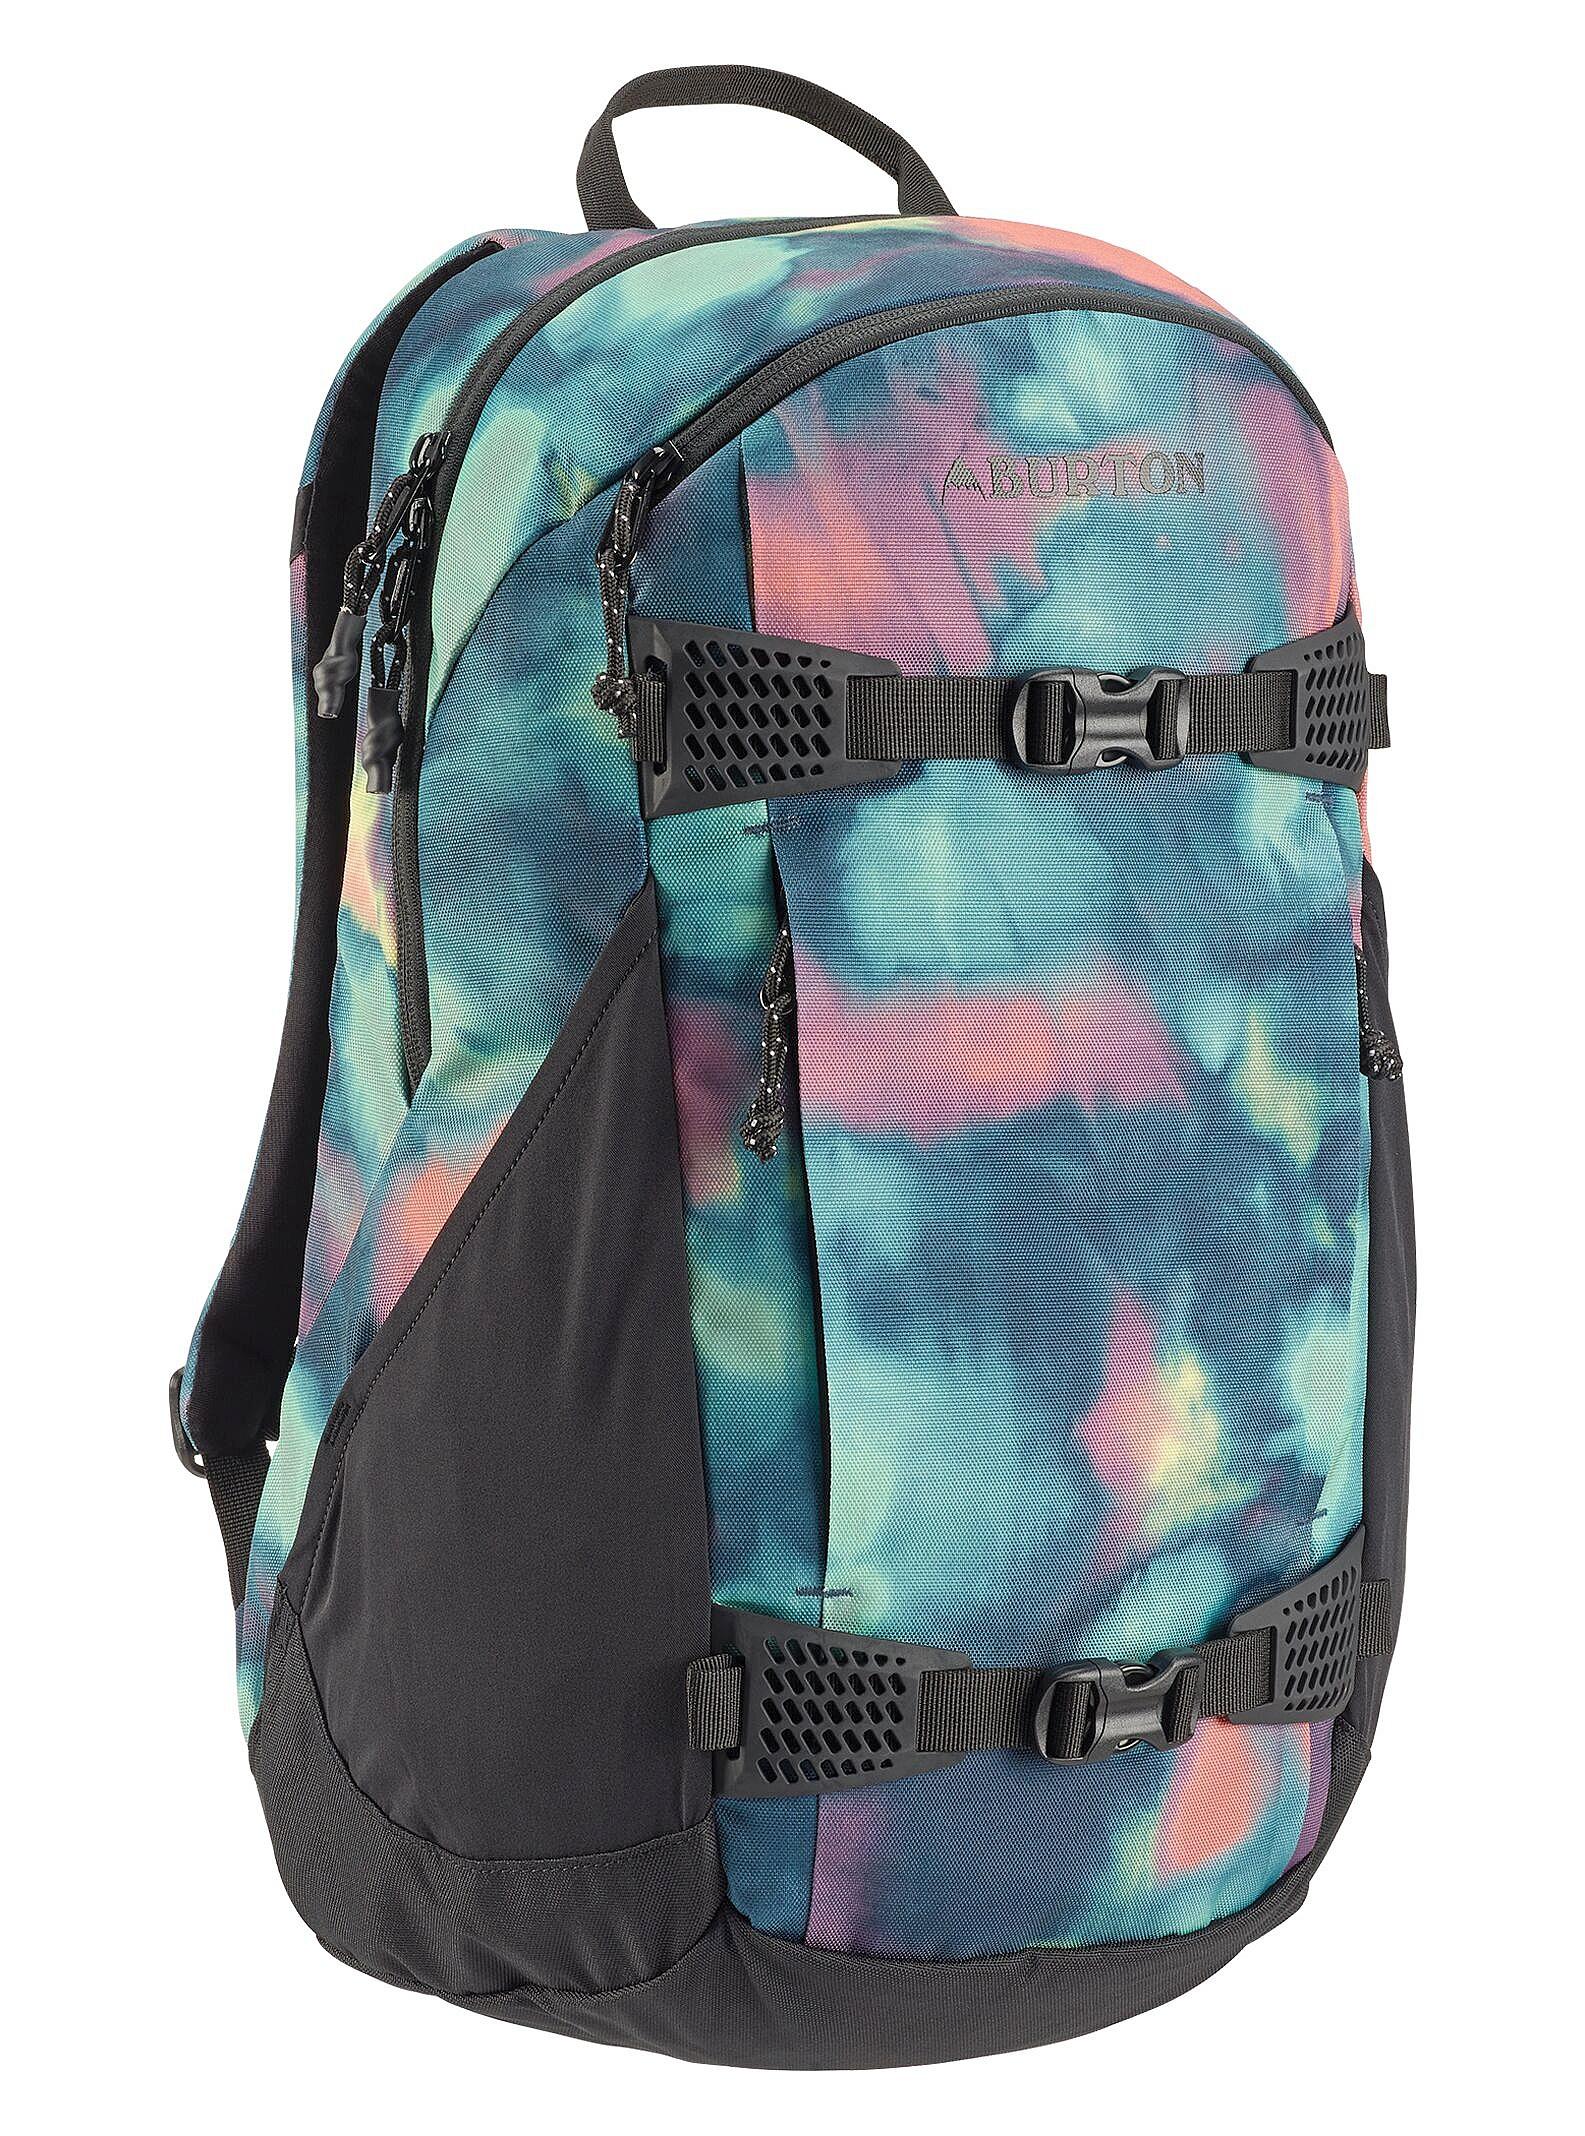 batoh Burton Day Hiker 25 - Aura Dye 25 L